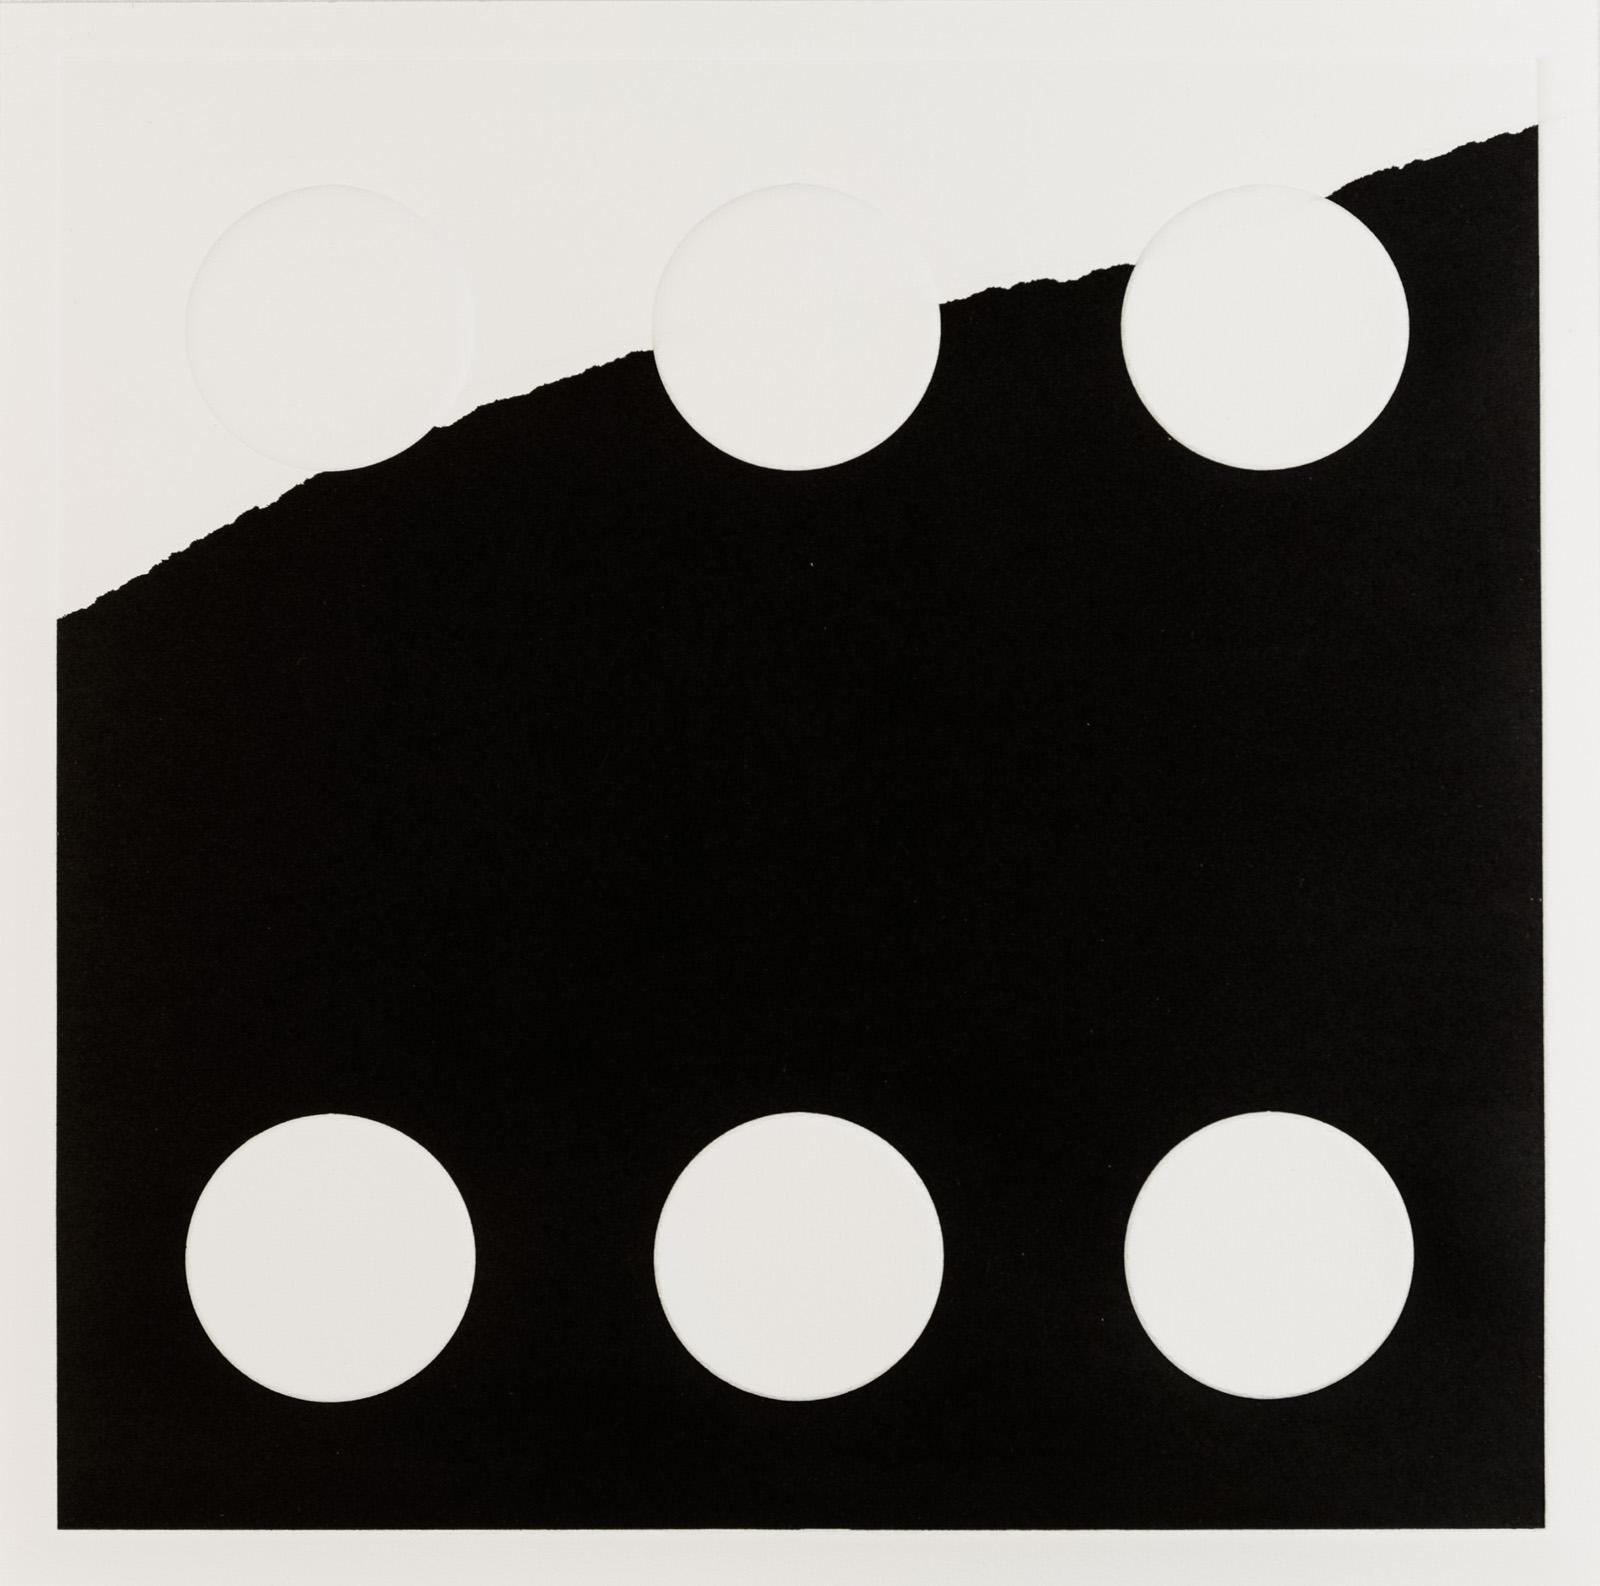 Kristina Matousch, What Lies Ahead 6, 2017, Unique print from an edition of 8, 31,5 x 31,5 cm